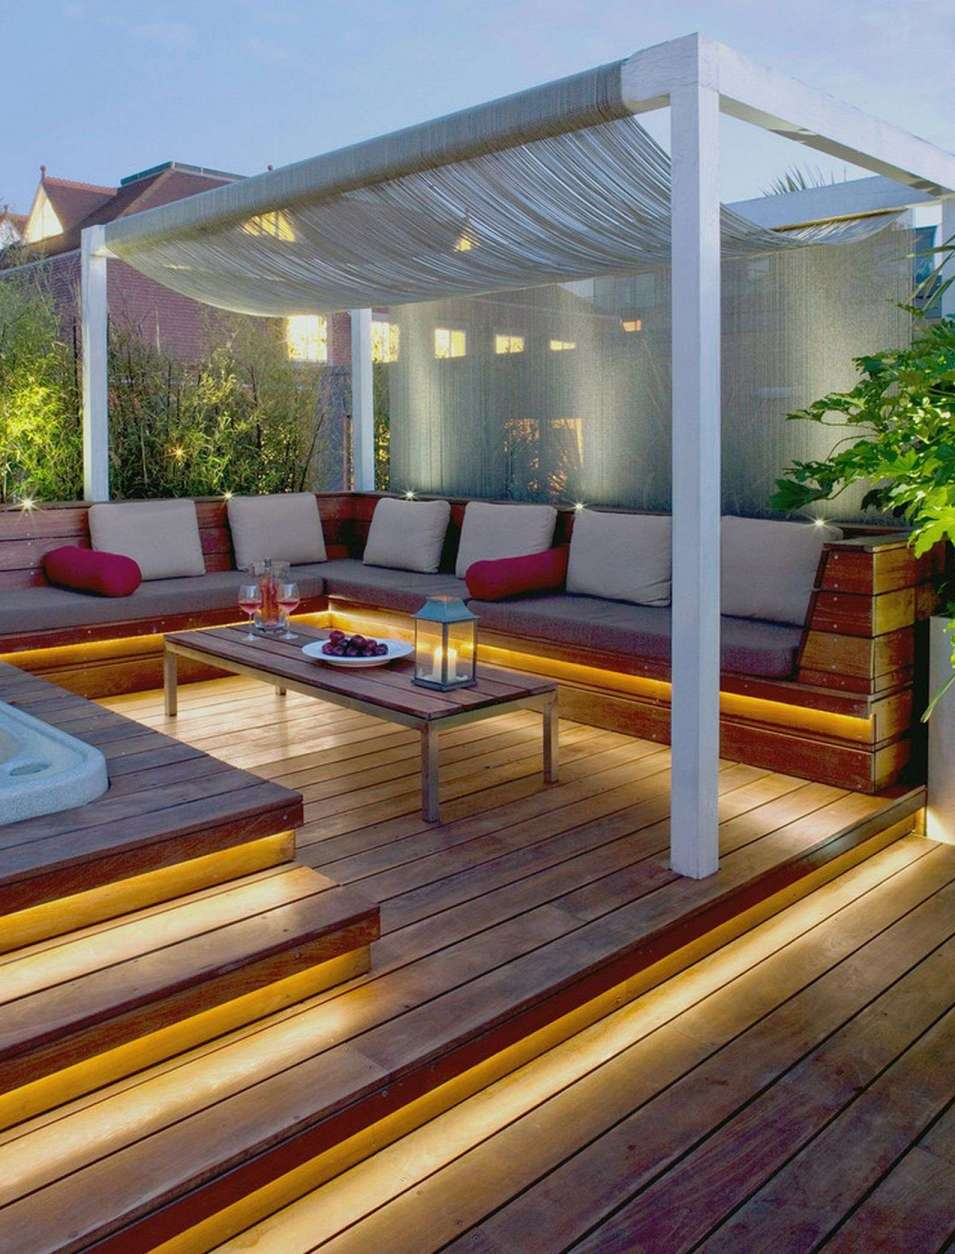 ... 39 awesome garden decking ideas inspiration of garden decking ideas ... DQNAPQF